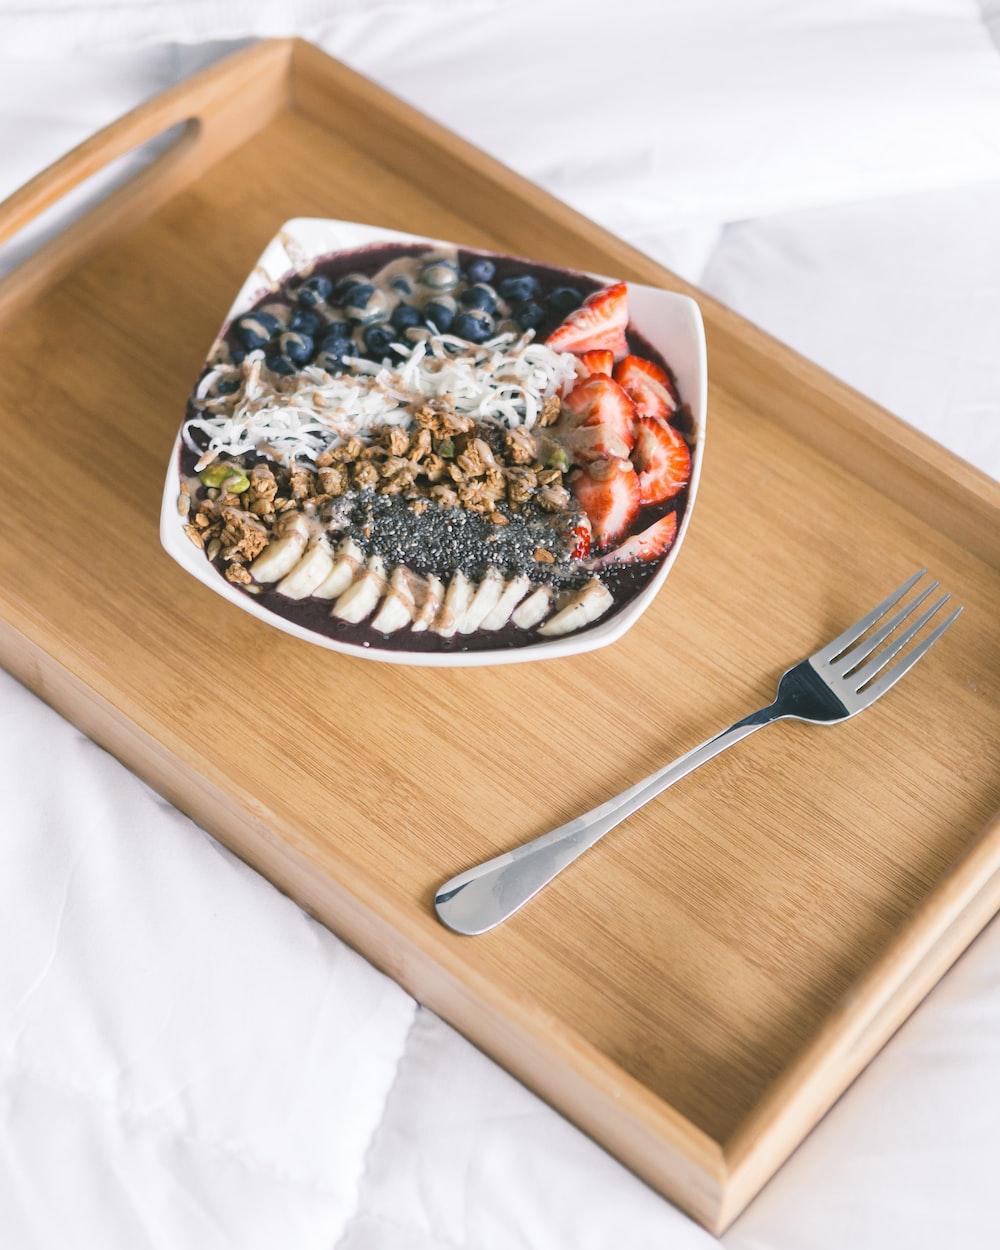 sliced fruit in bowl beside fork on brown serving tray